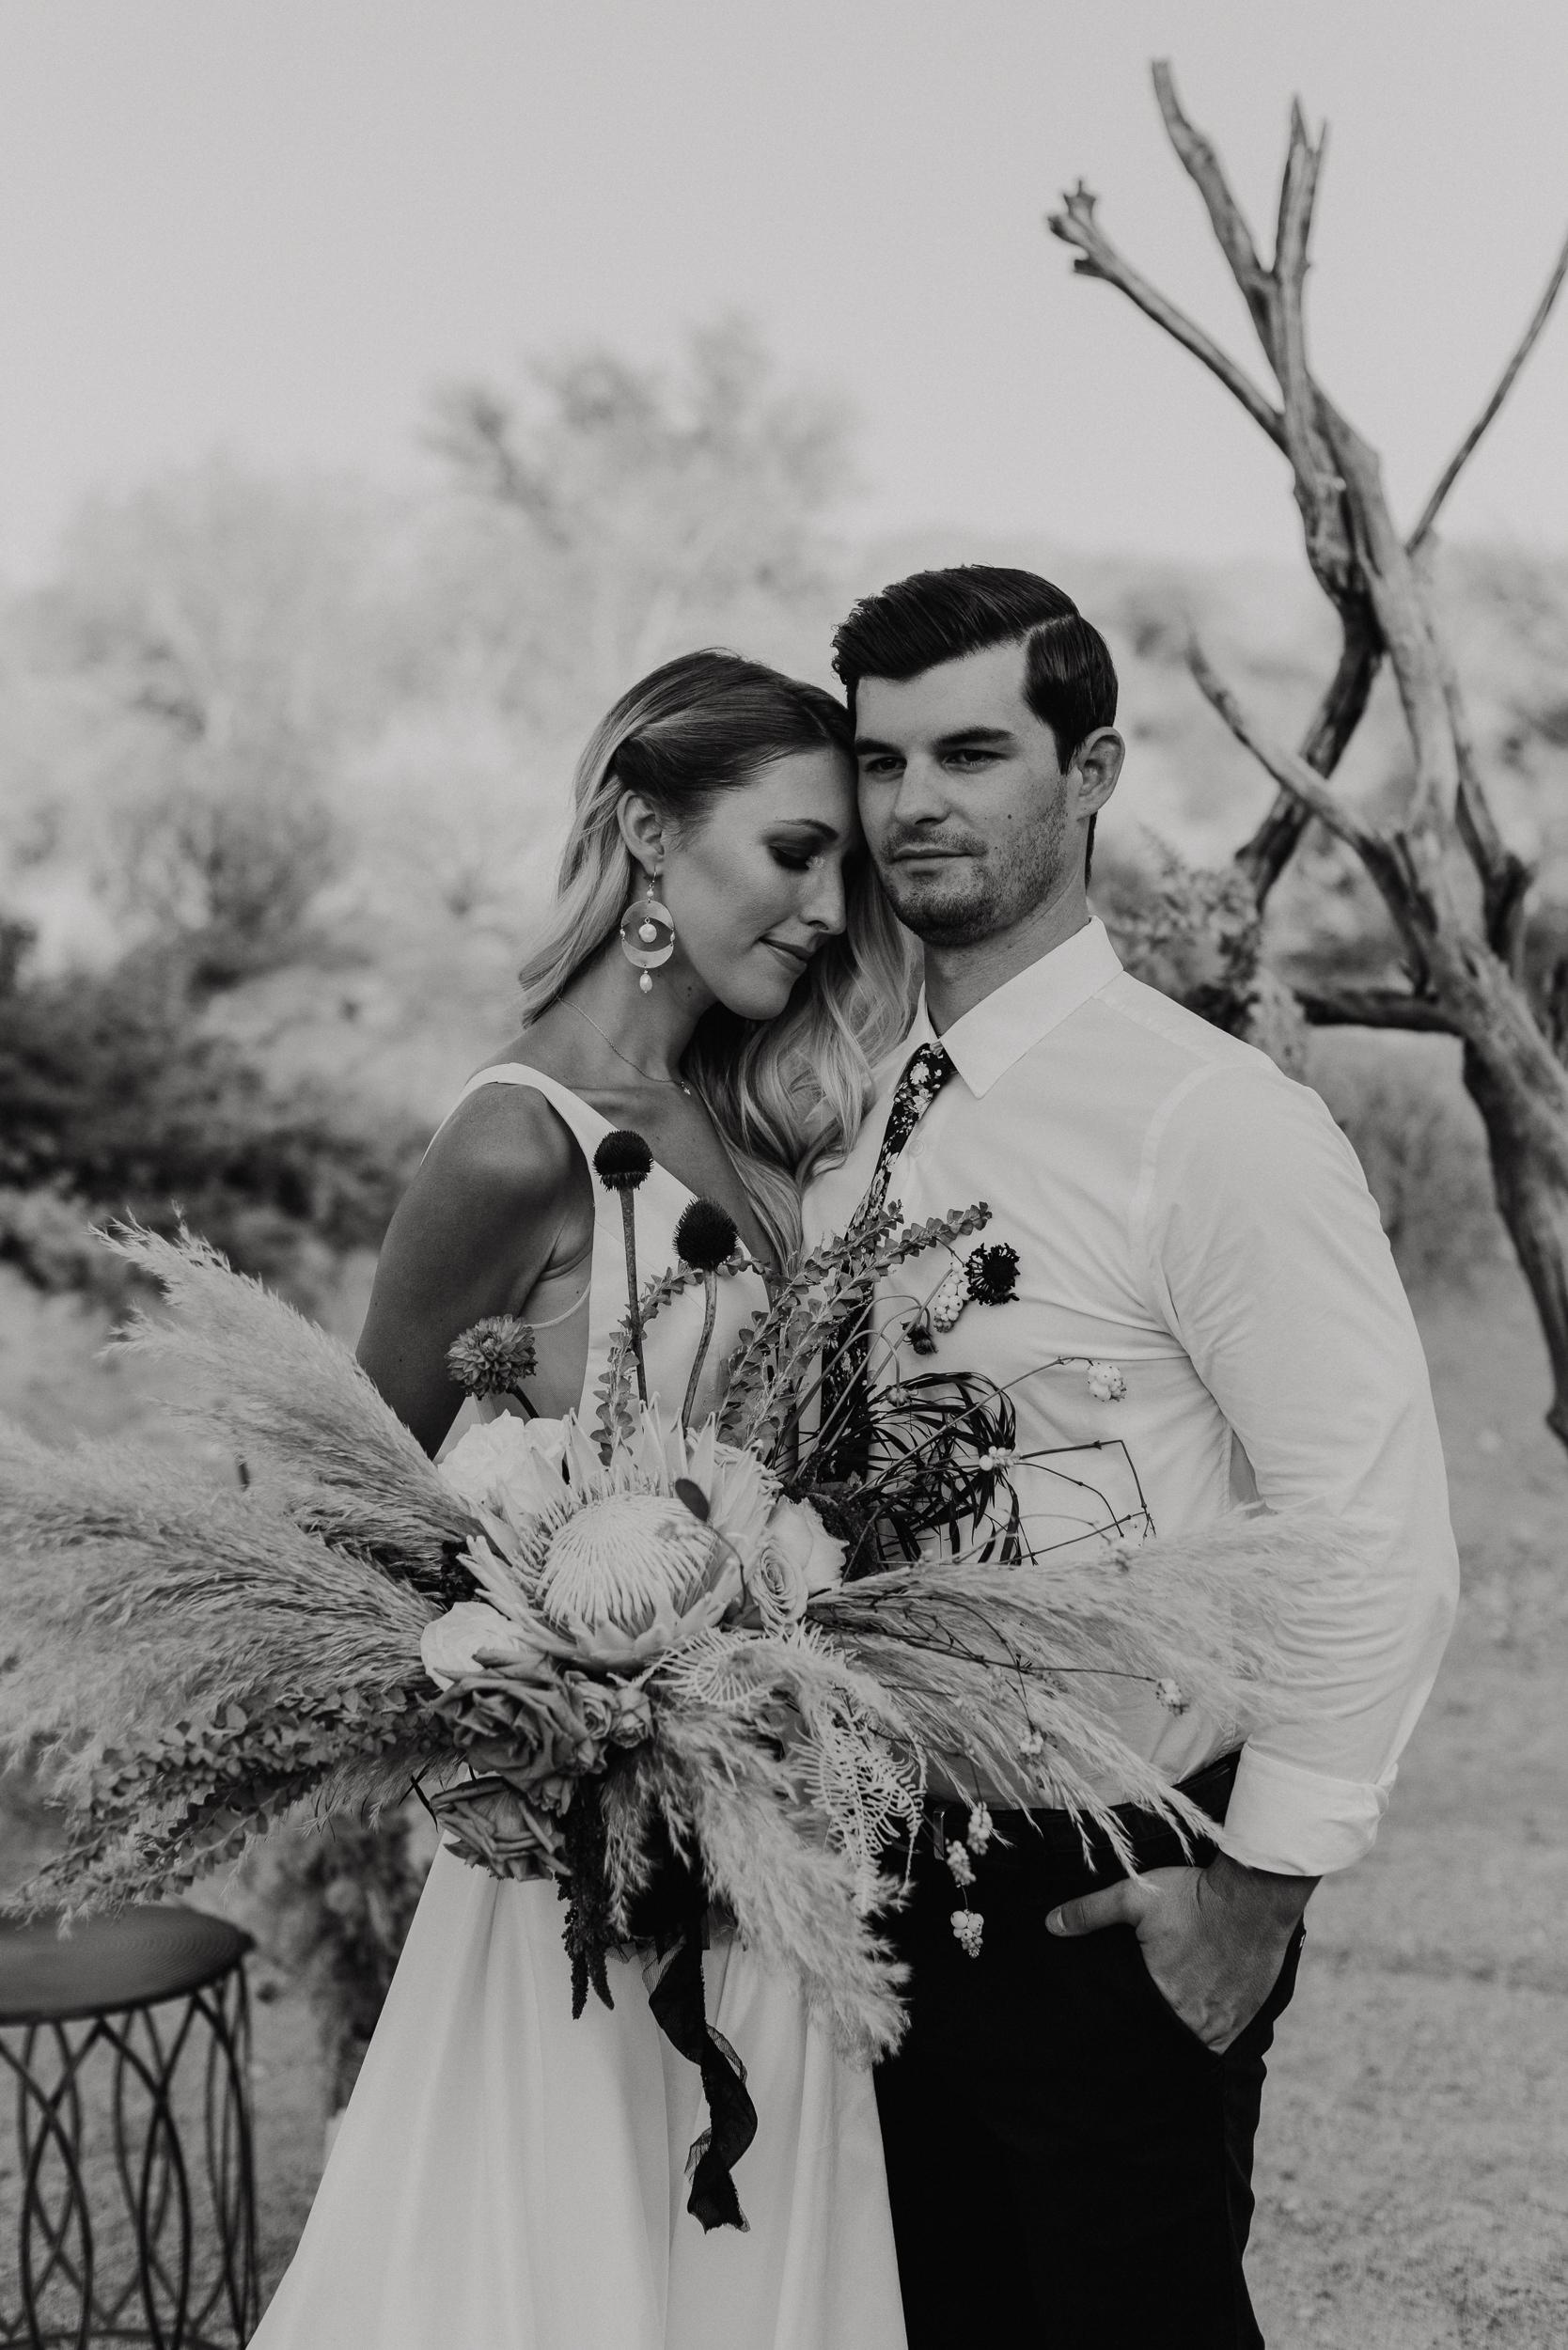 sChelsie + Chris - The Desert Shootout Wedding Romantics at The Living Desert-54.jpg